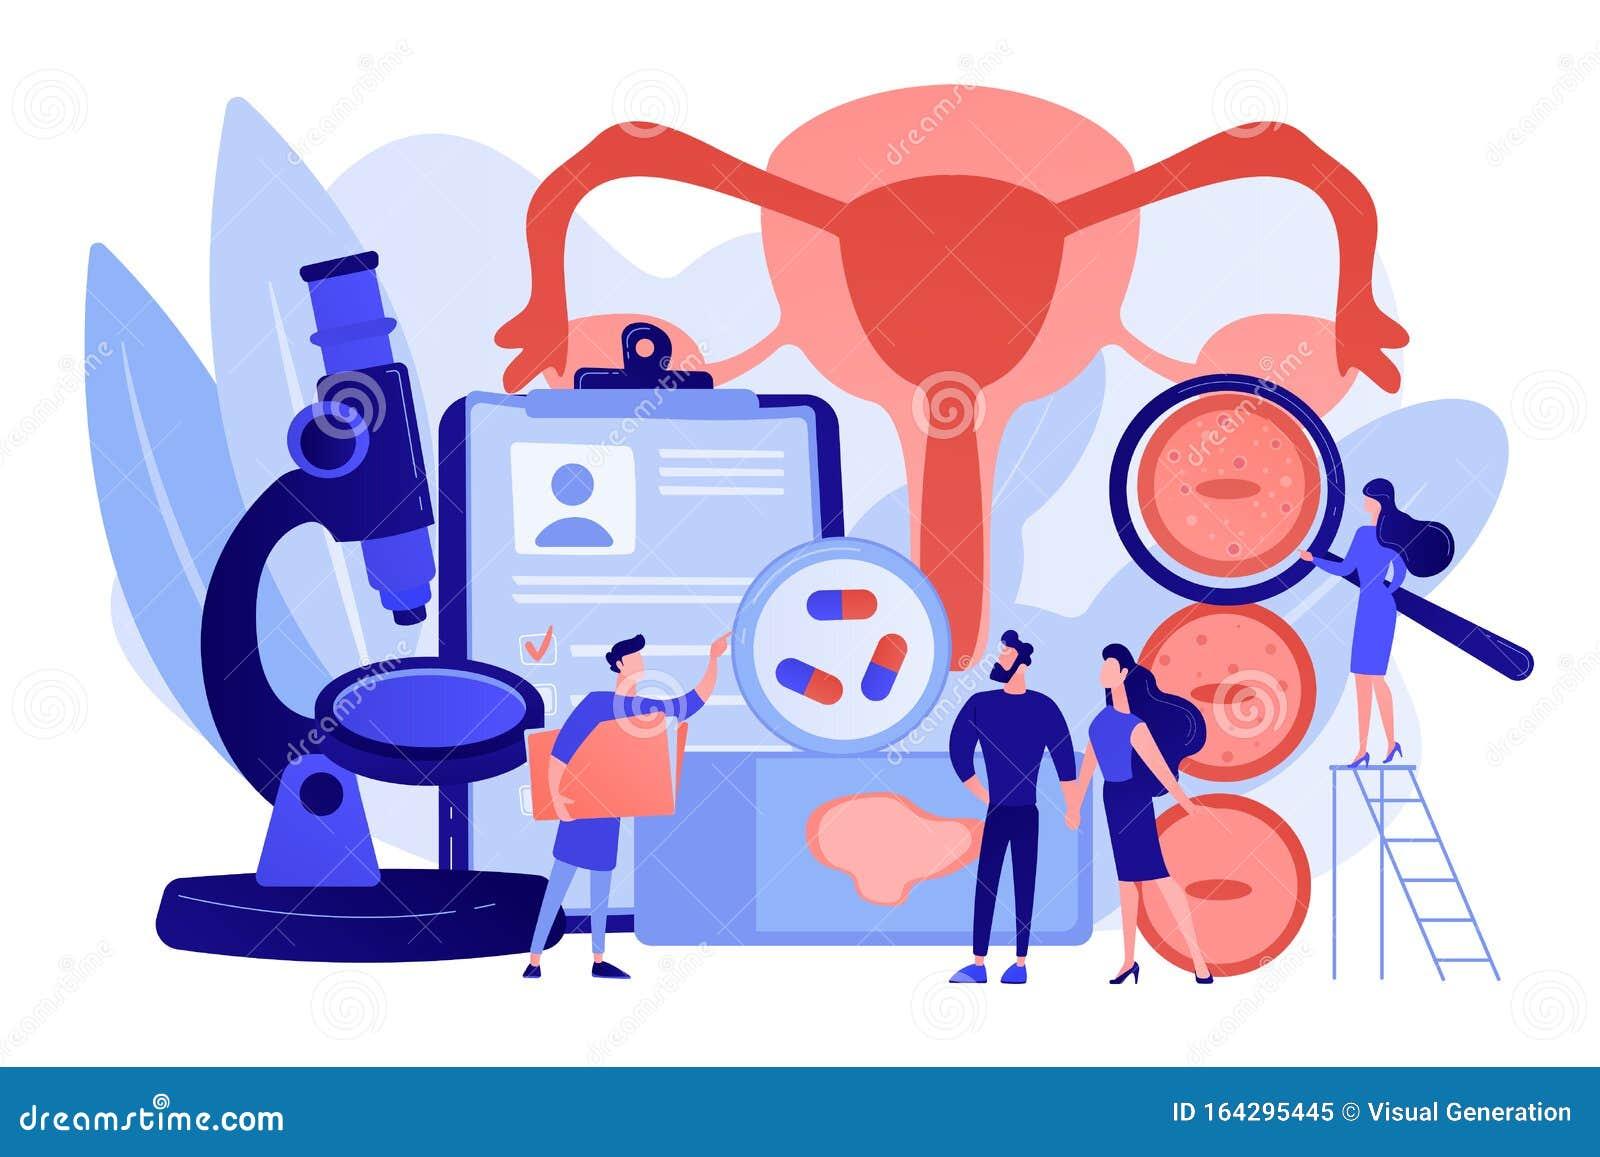 Hpv virus nederlands Hpv virus nederlands, Ce tipuri de cancere pot fi cauzate de infecţia cu HPV